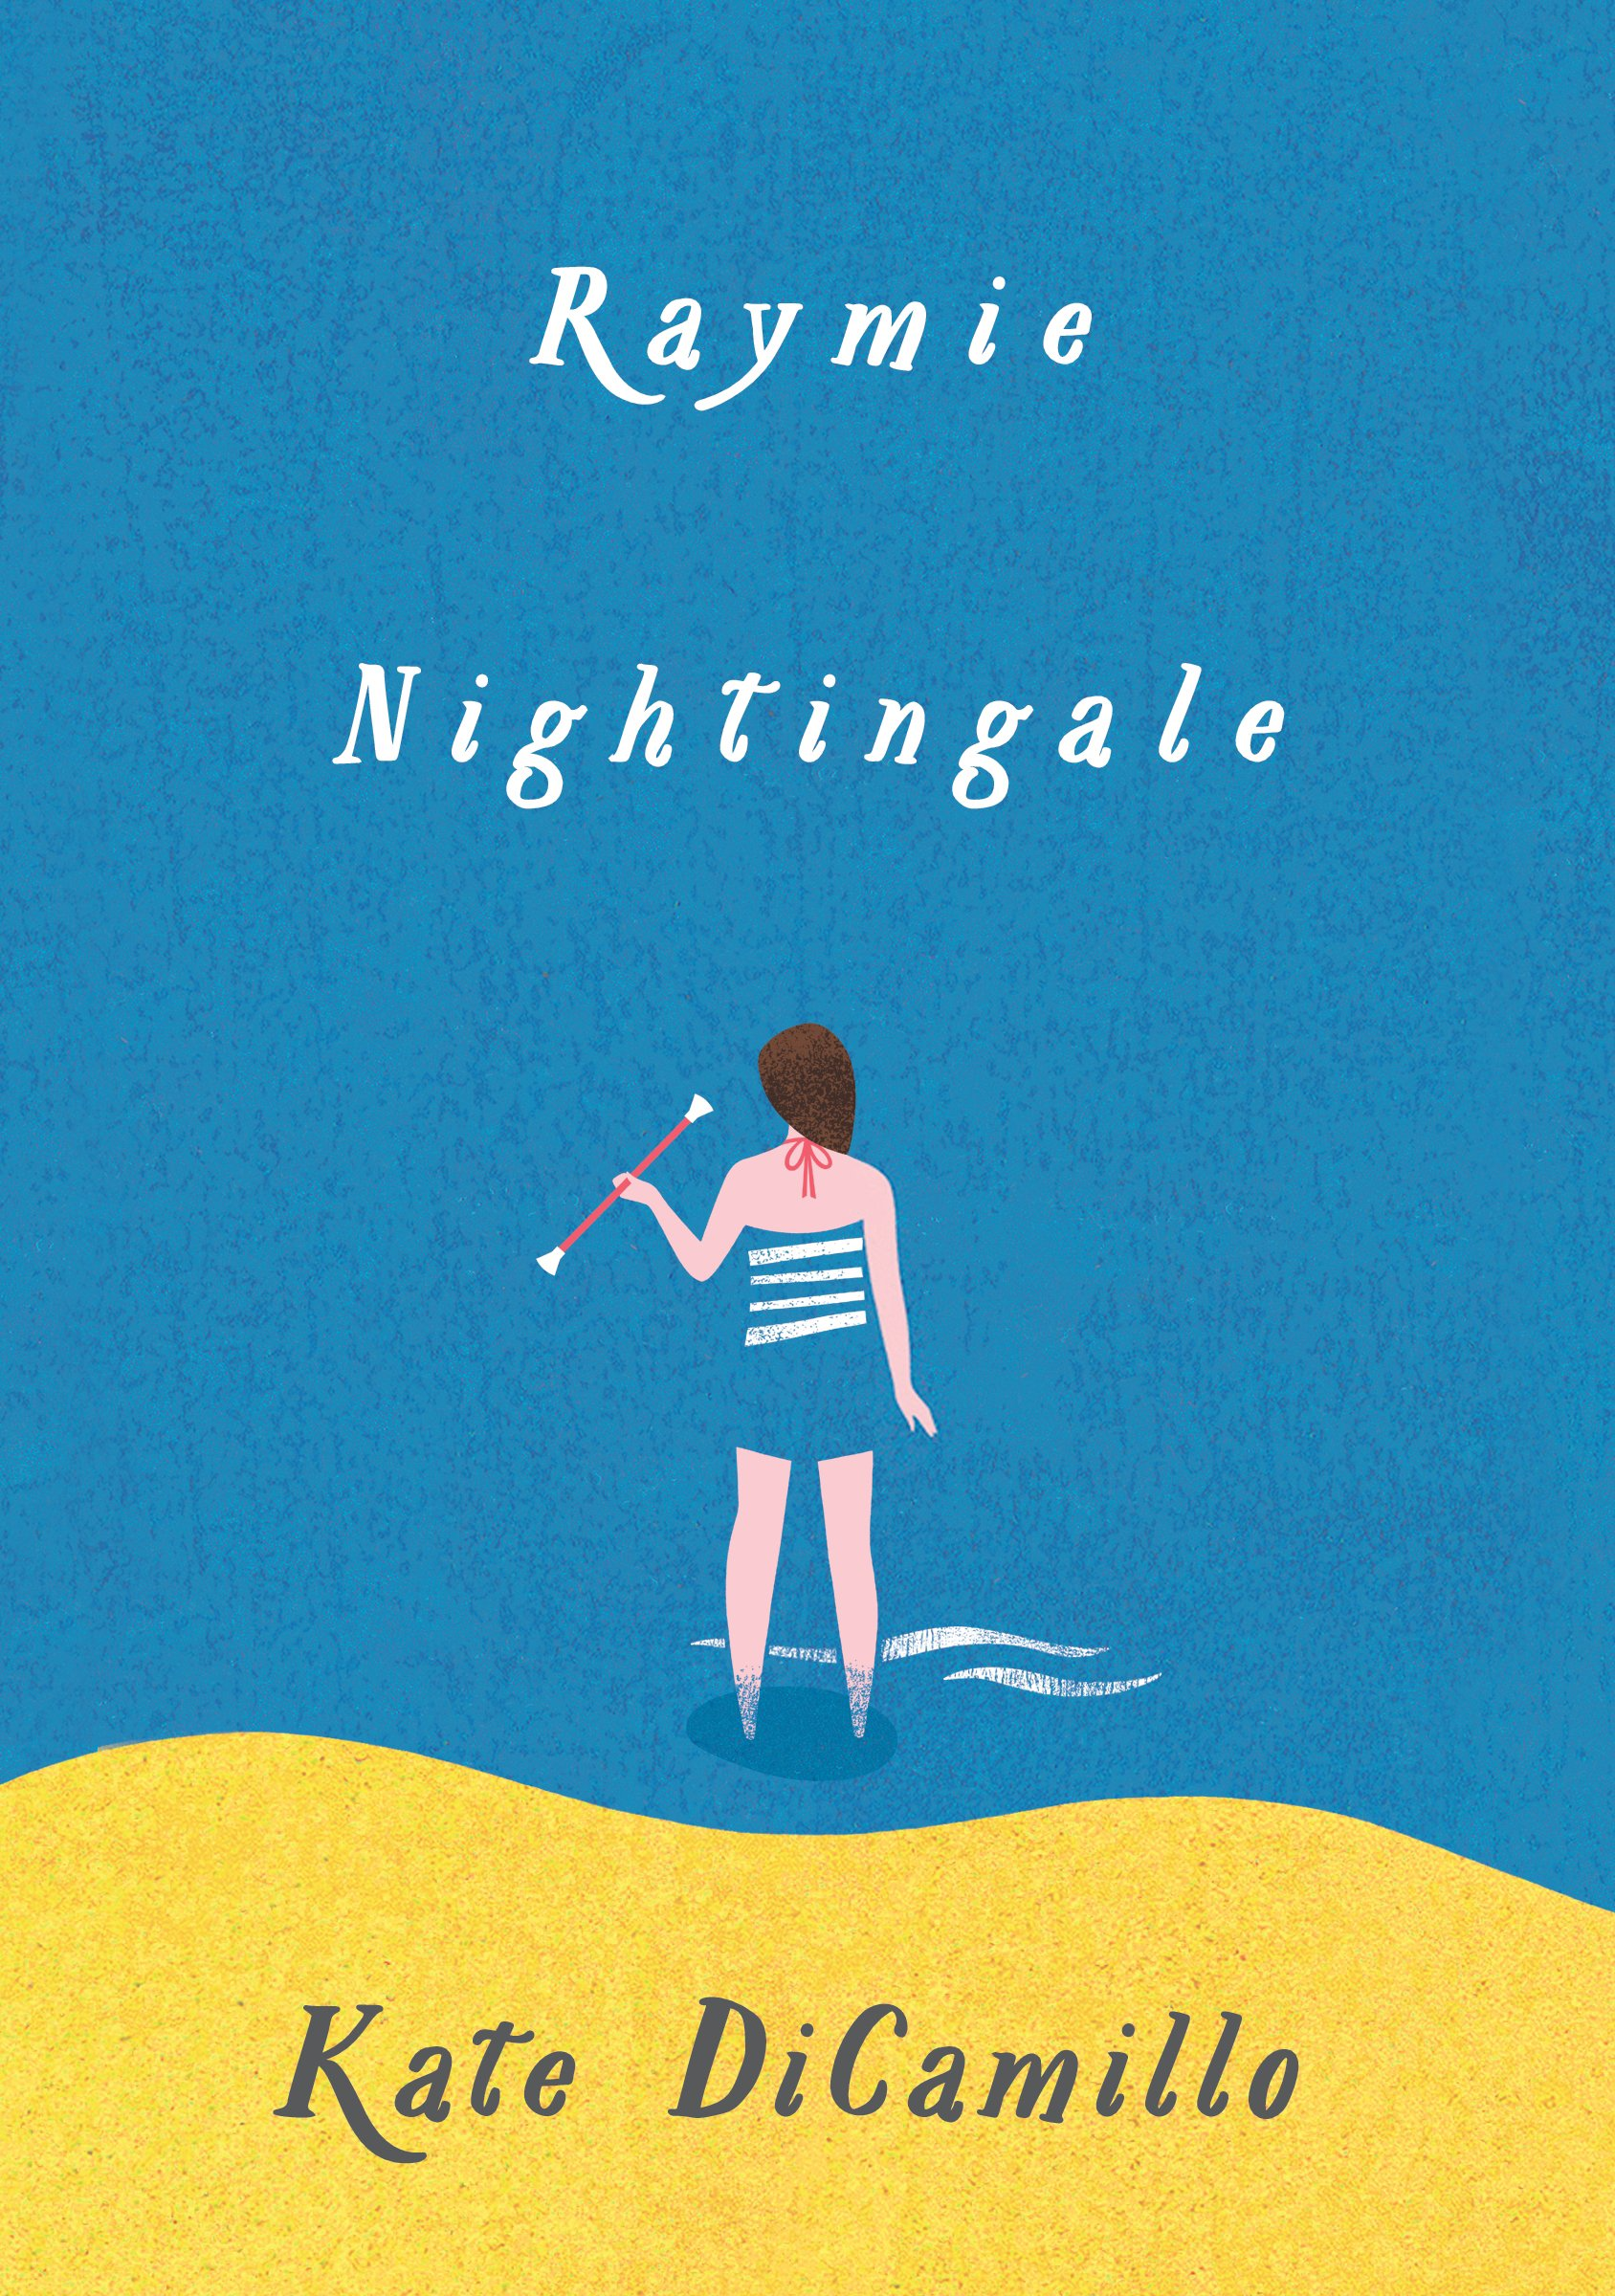 Raymie Nightingale ISBN-13 9780763681173